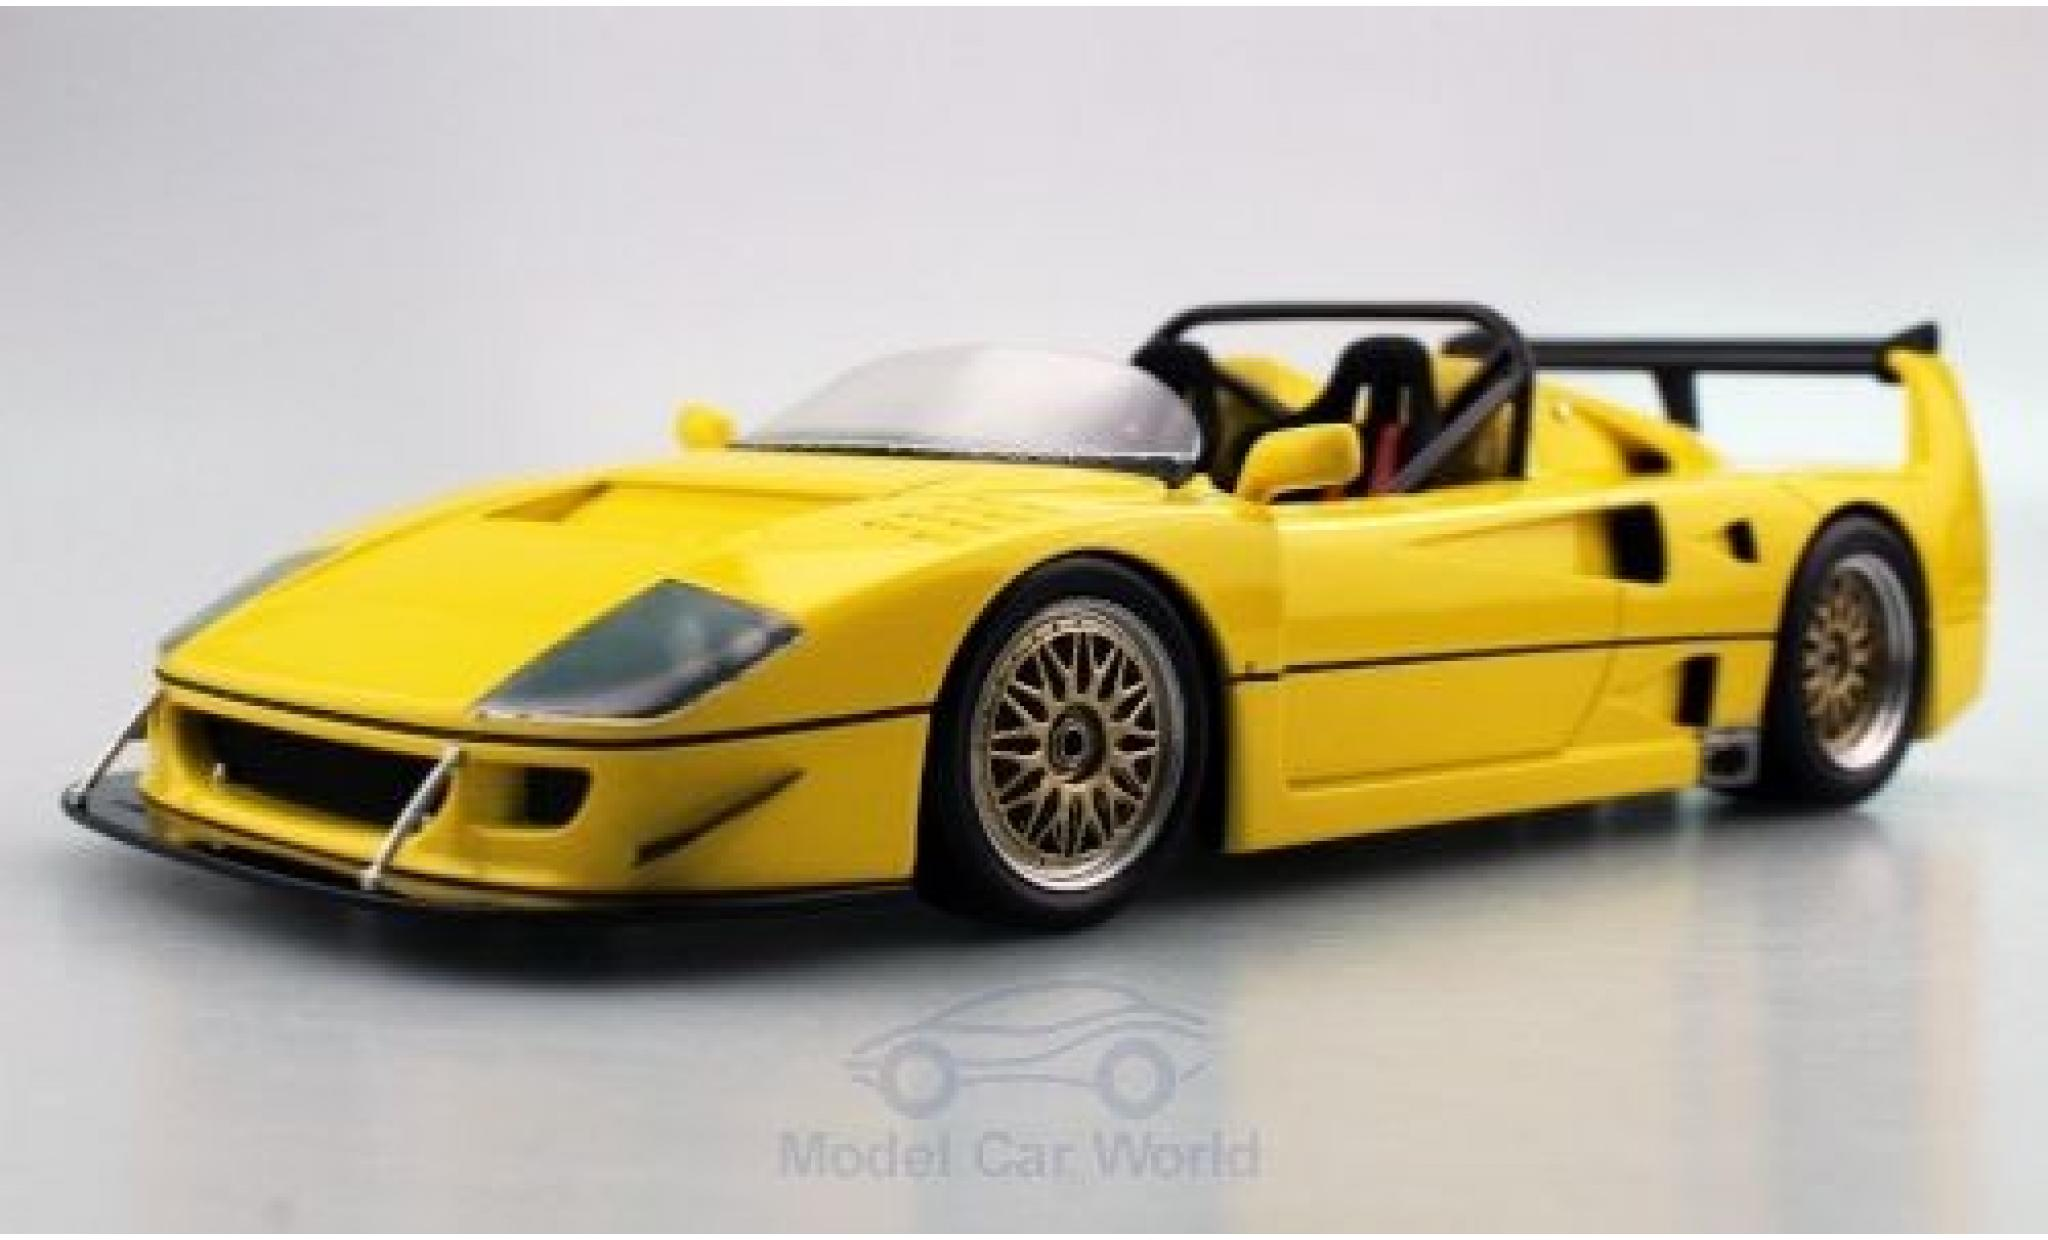 Ferrari F40 1/18 Topmarques Collectibles LM Beurlys Barchetta jaune